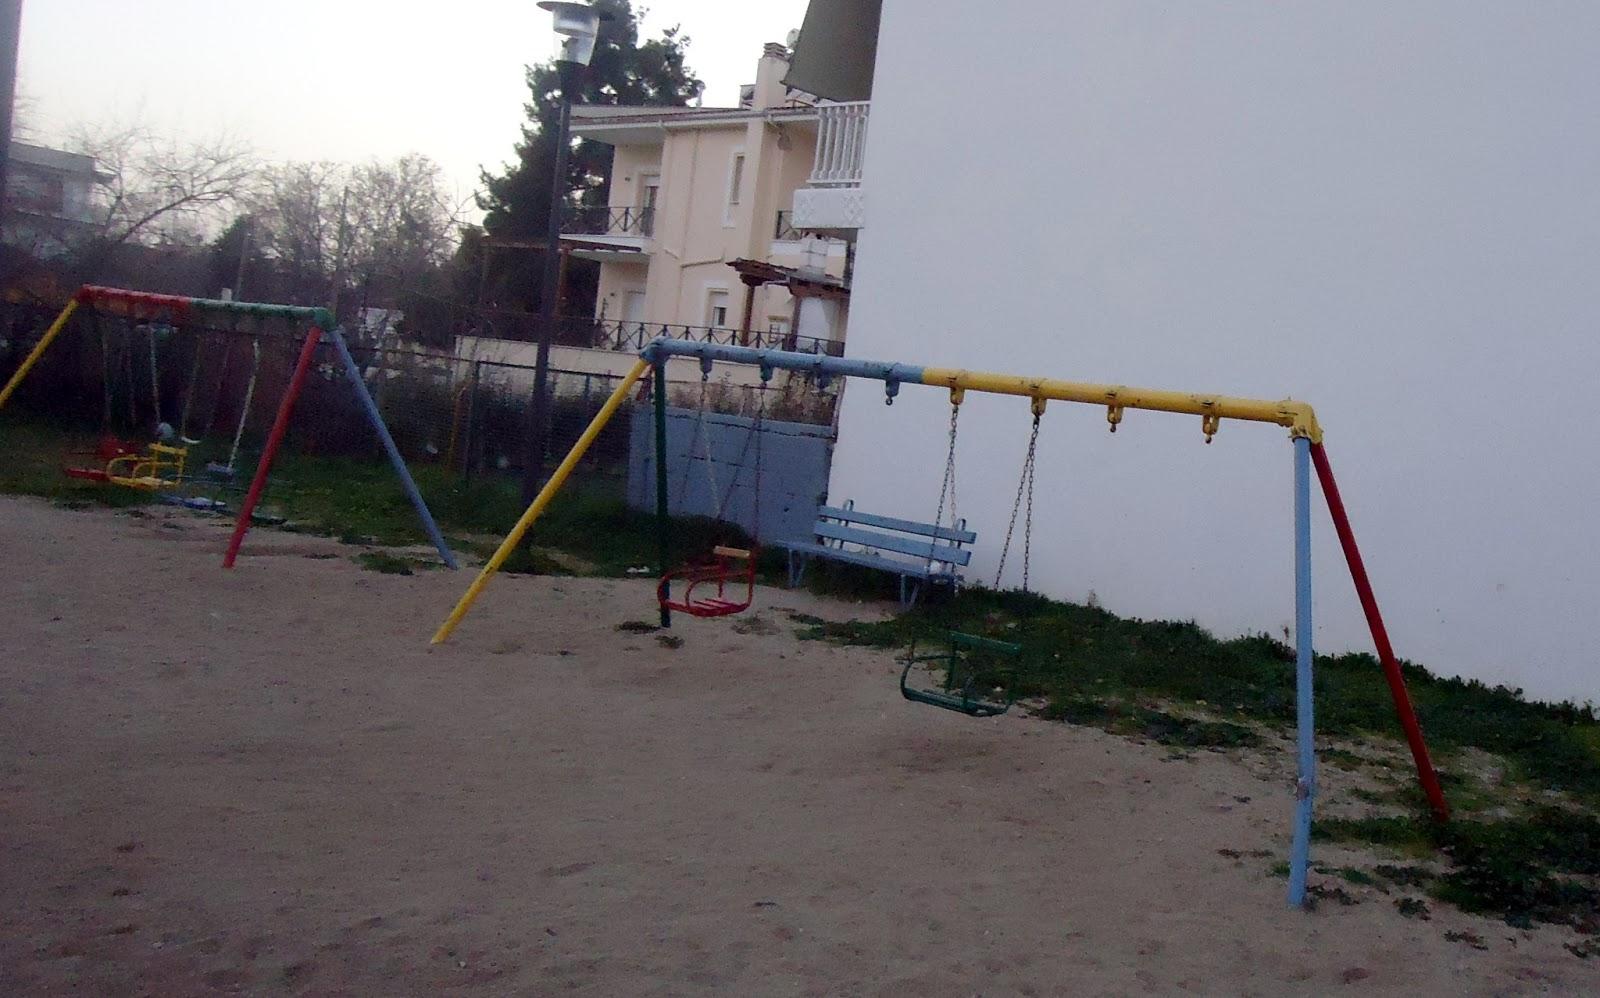 8b77565ee82 ΠΡΑΣΙΝΗ ΠΟΛΗ: Παιδική χαρά στη περιοχή Αβέρωφ